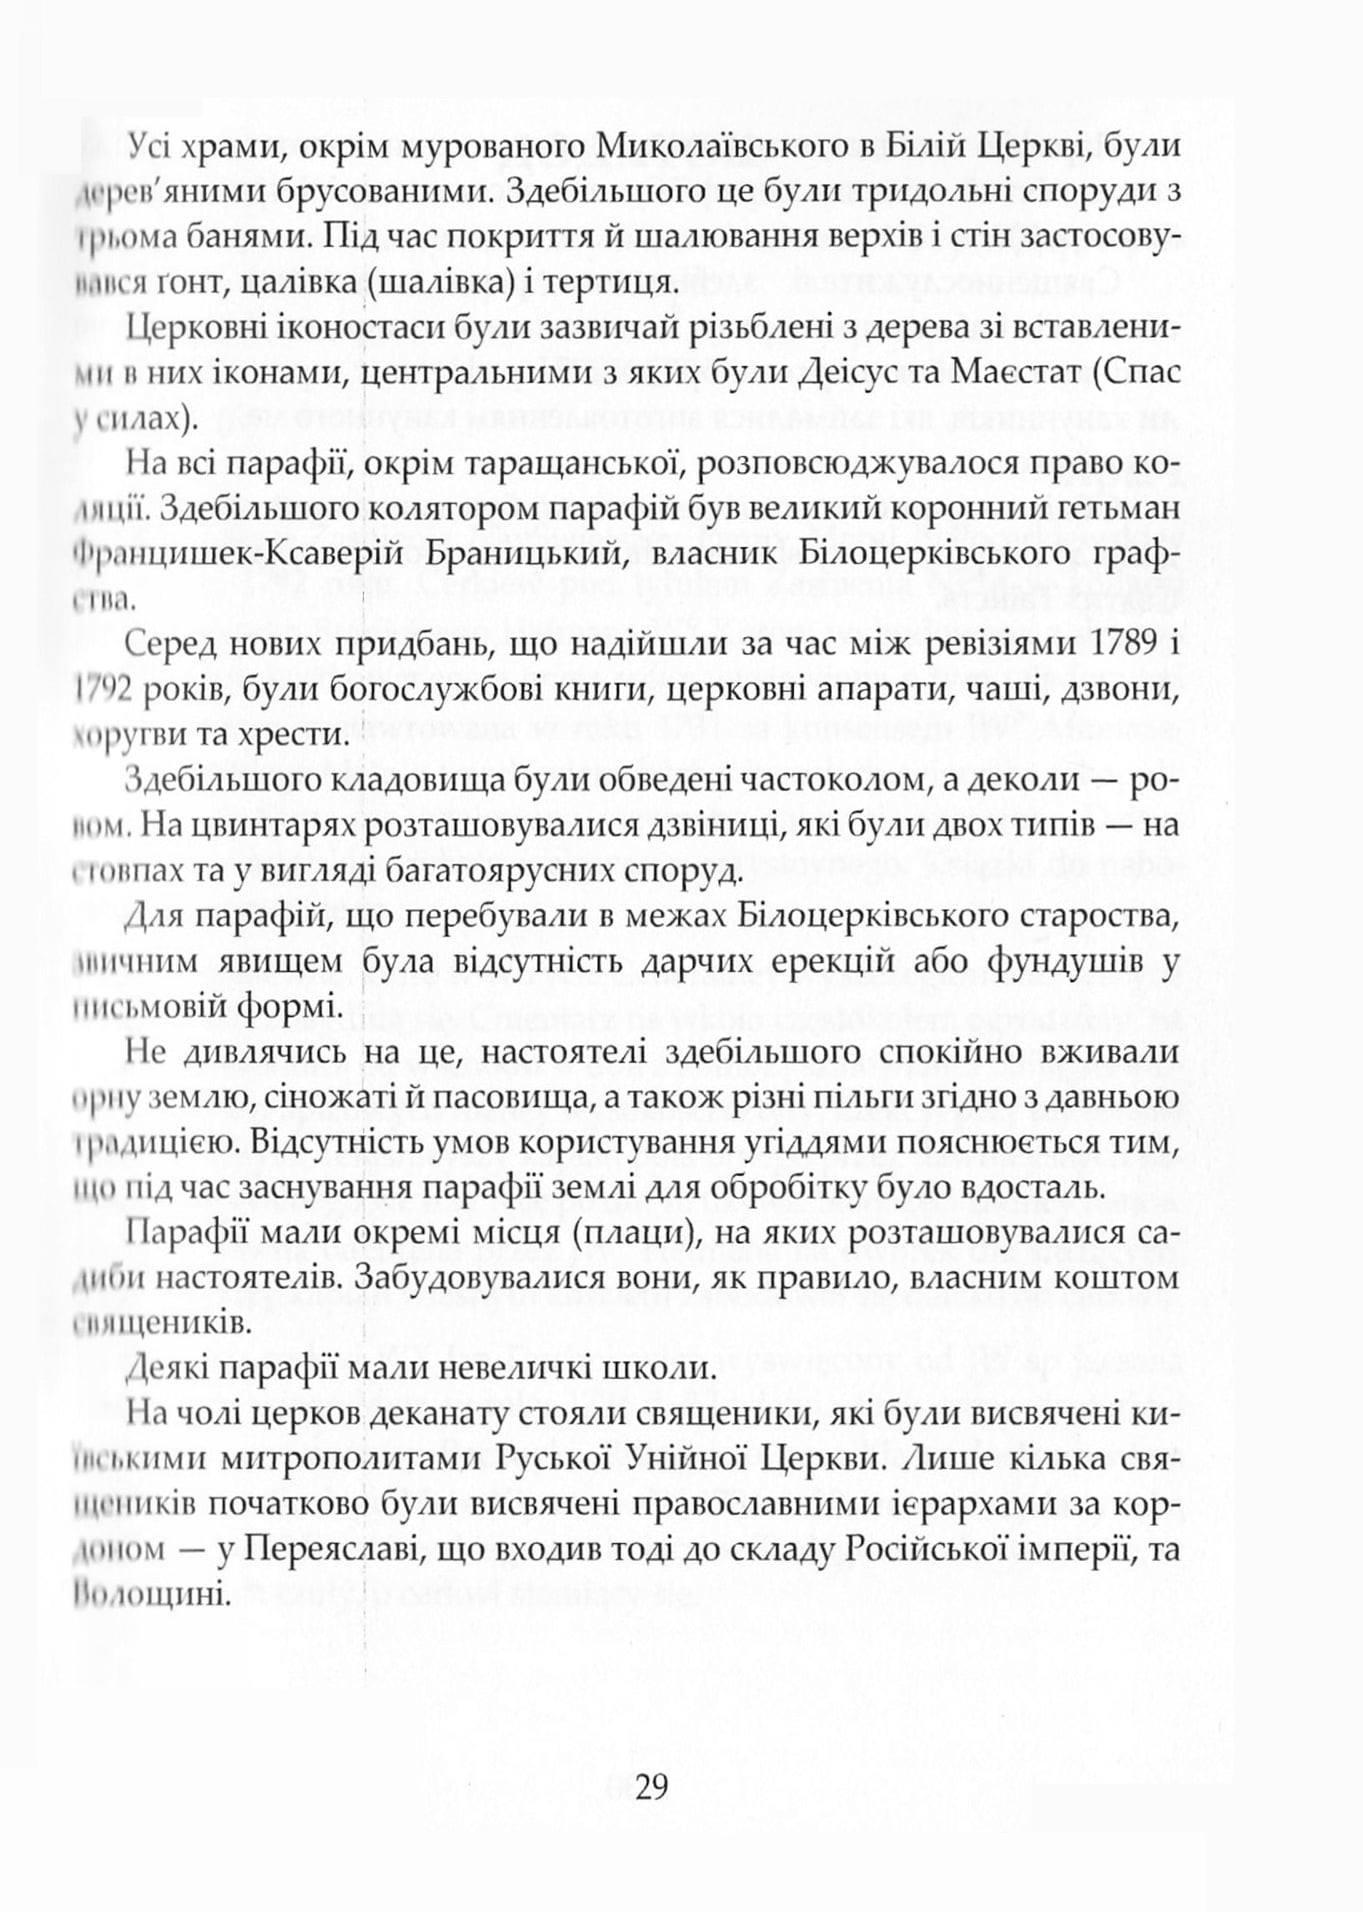 https://i6.imageban.ru/out/2021/09/23/6d061bf138620a4cf384852f0af00de6.jpg